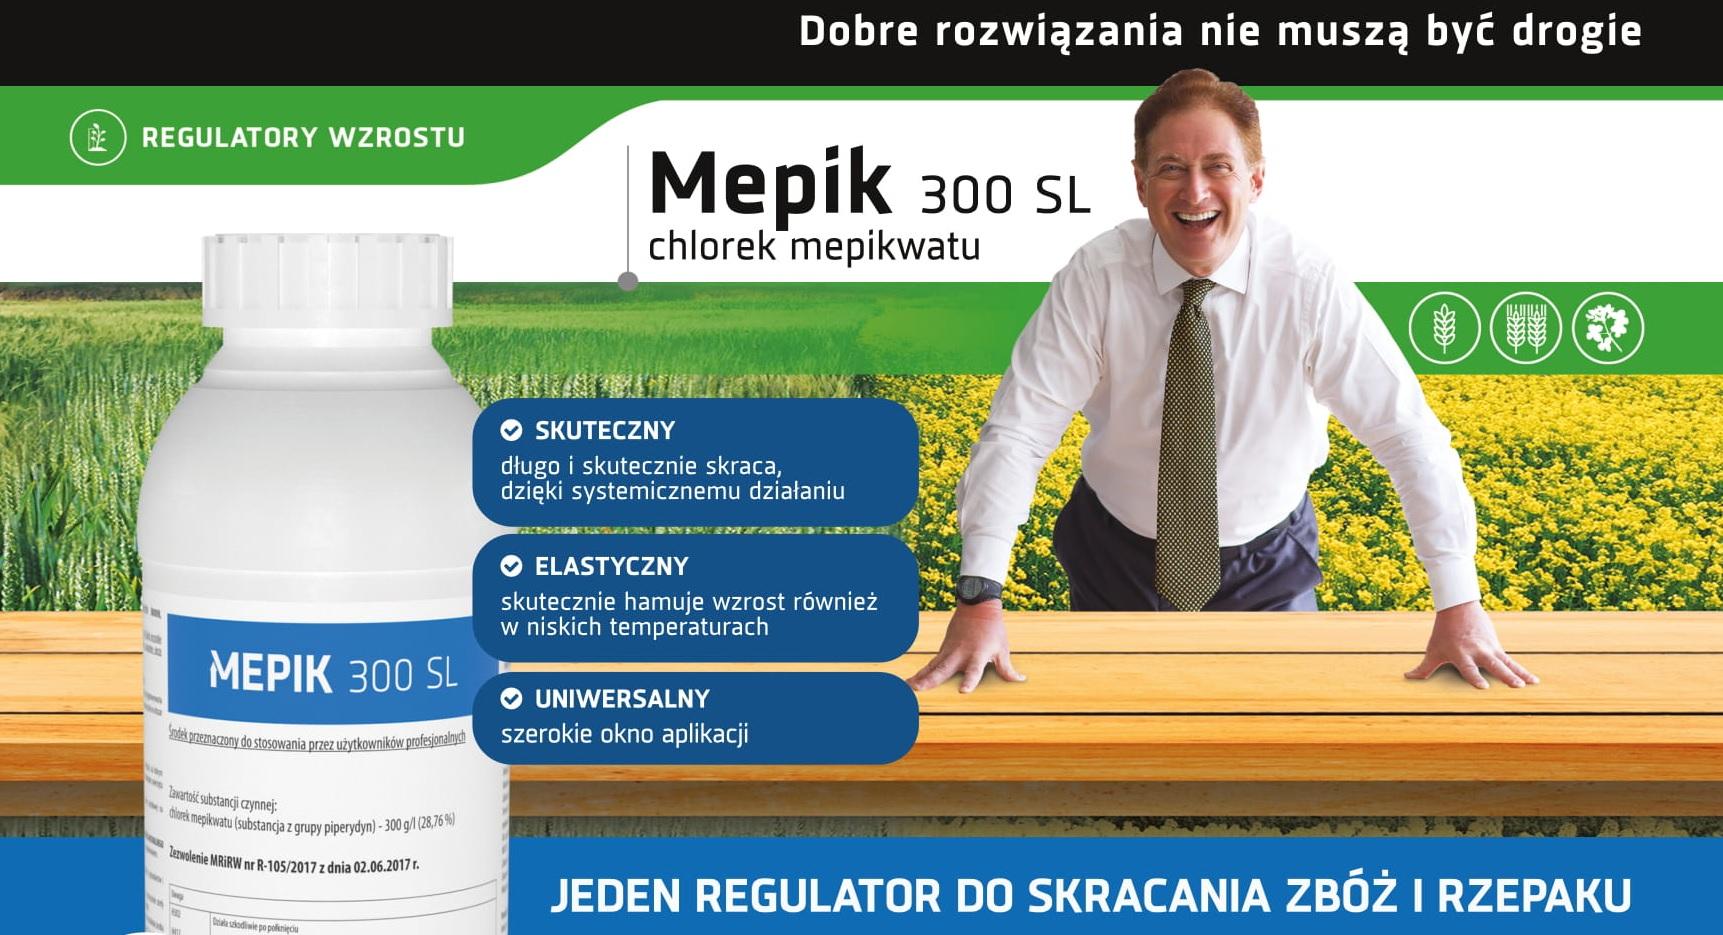 Mepik regulator wzrostu